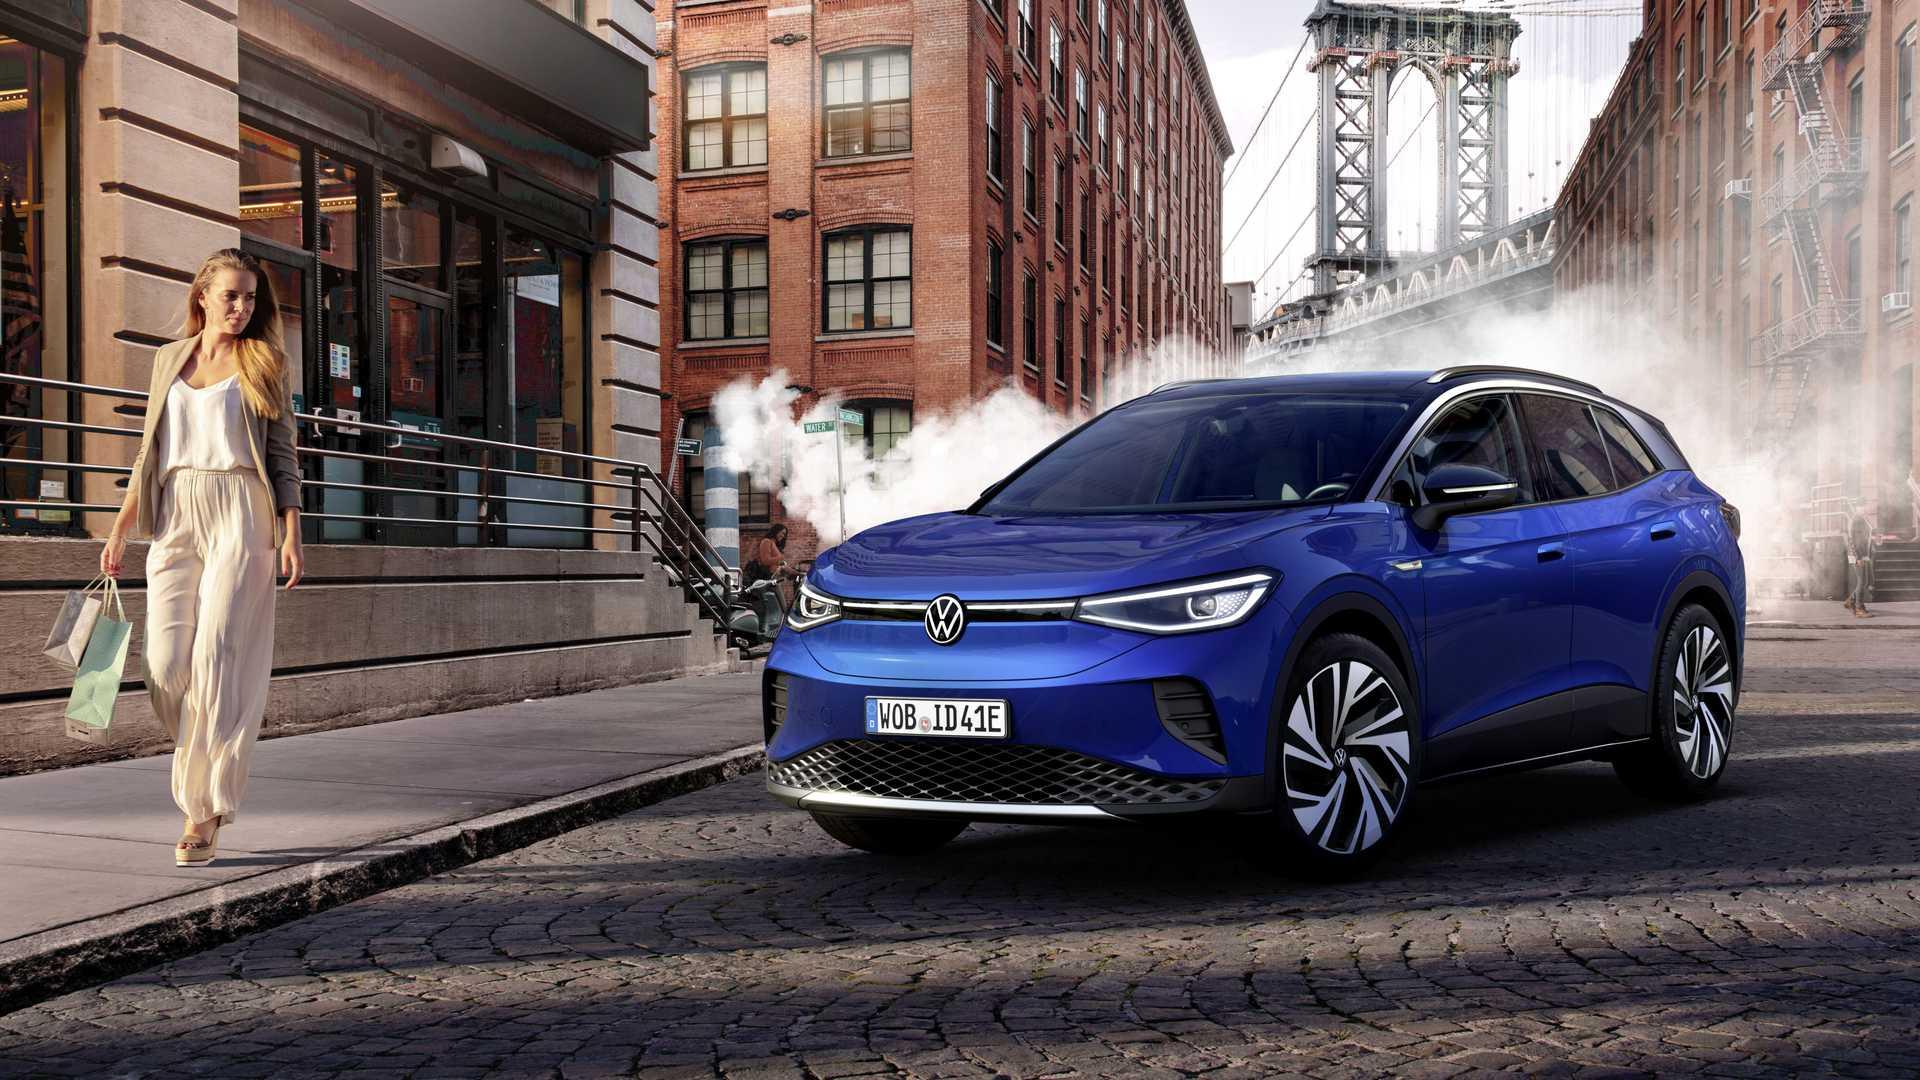 Volkswagen Id4 1st Blue Street